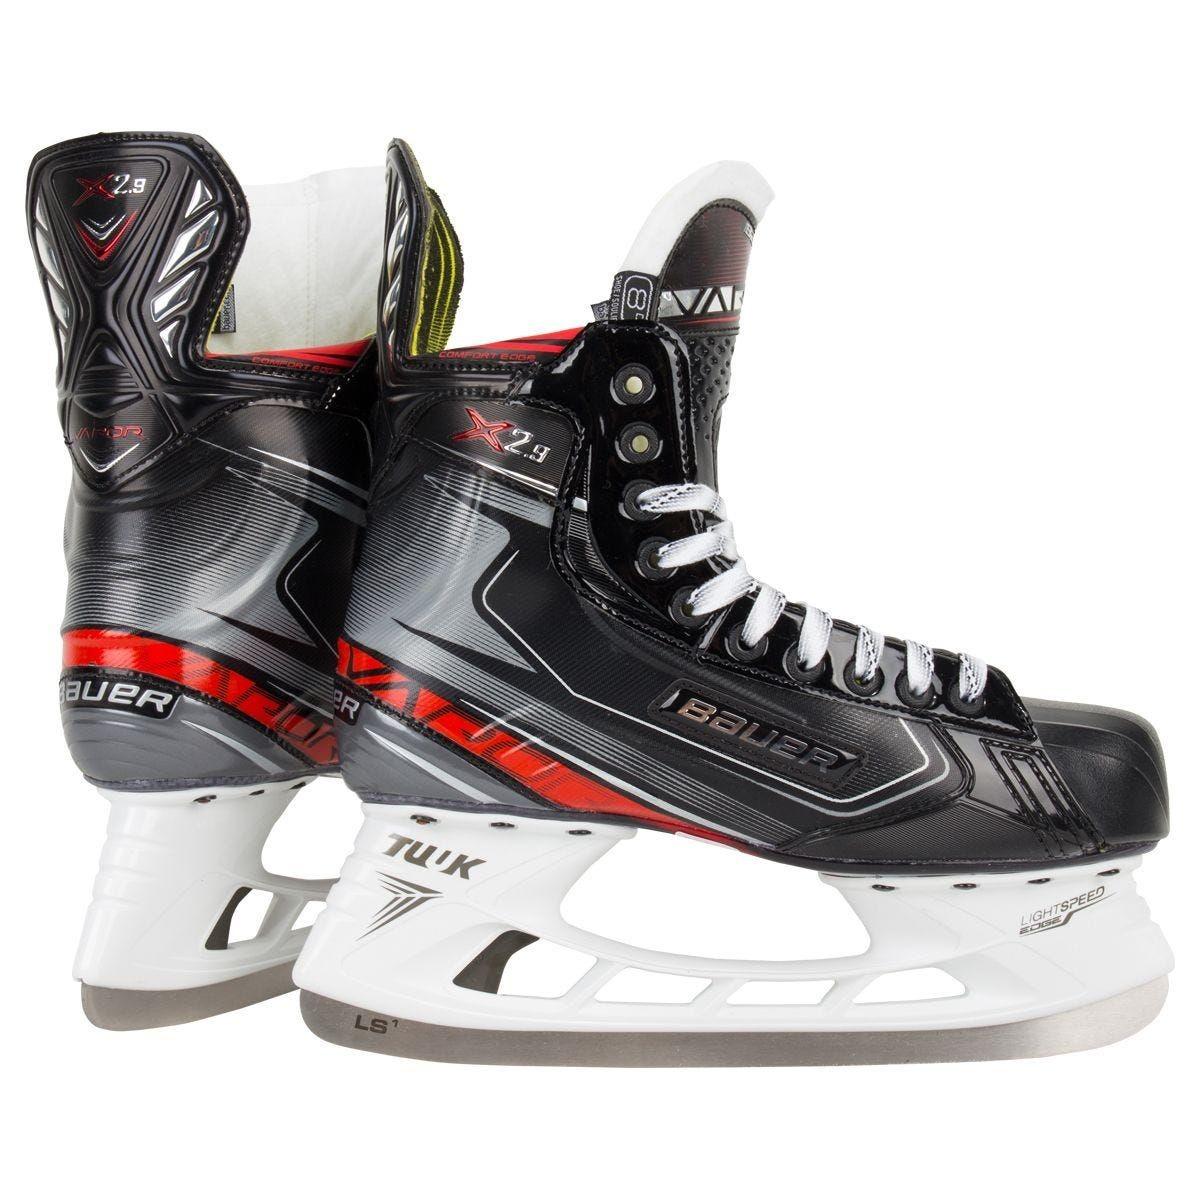 BAUER Vapor X2.9 S19 Senior Ice Hockey Skates